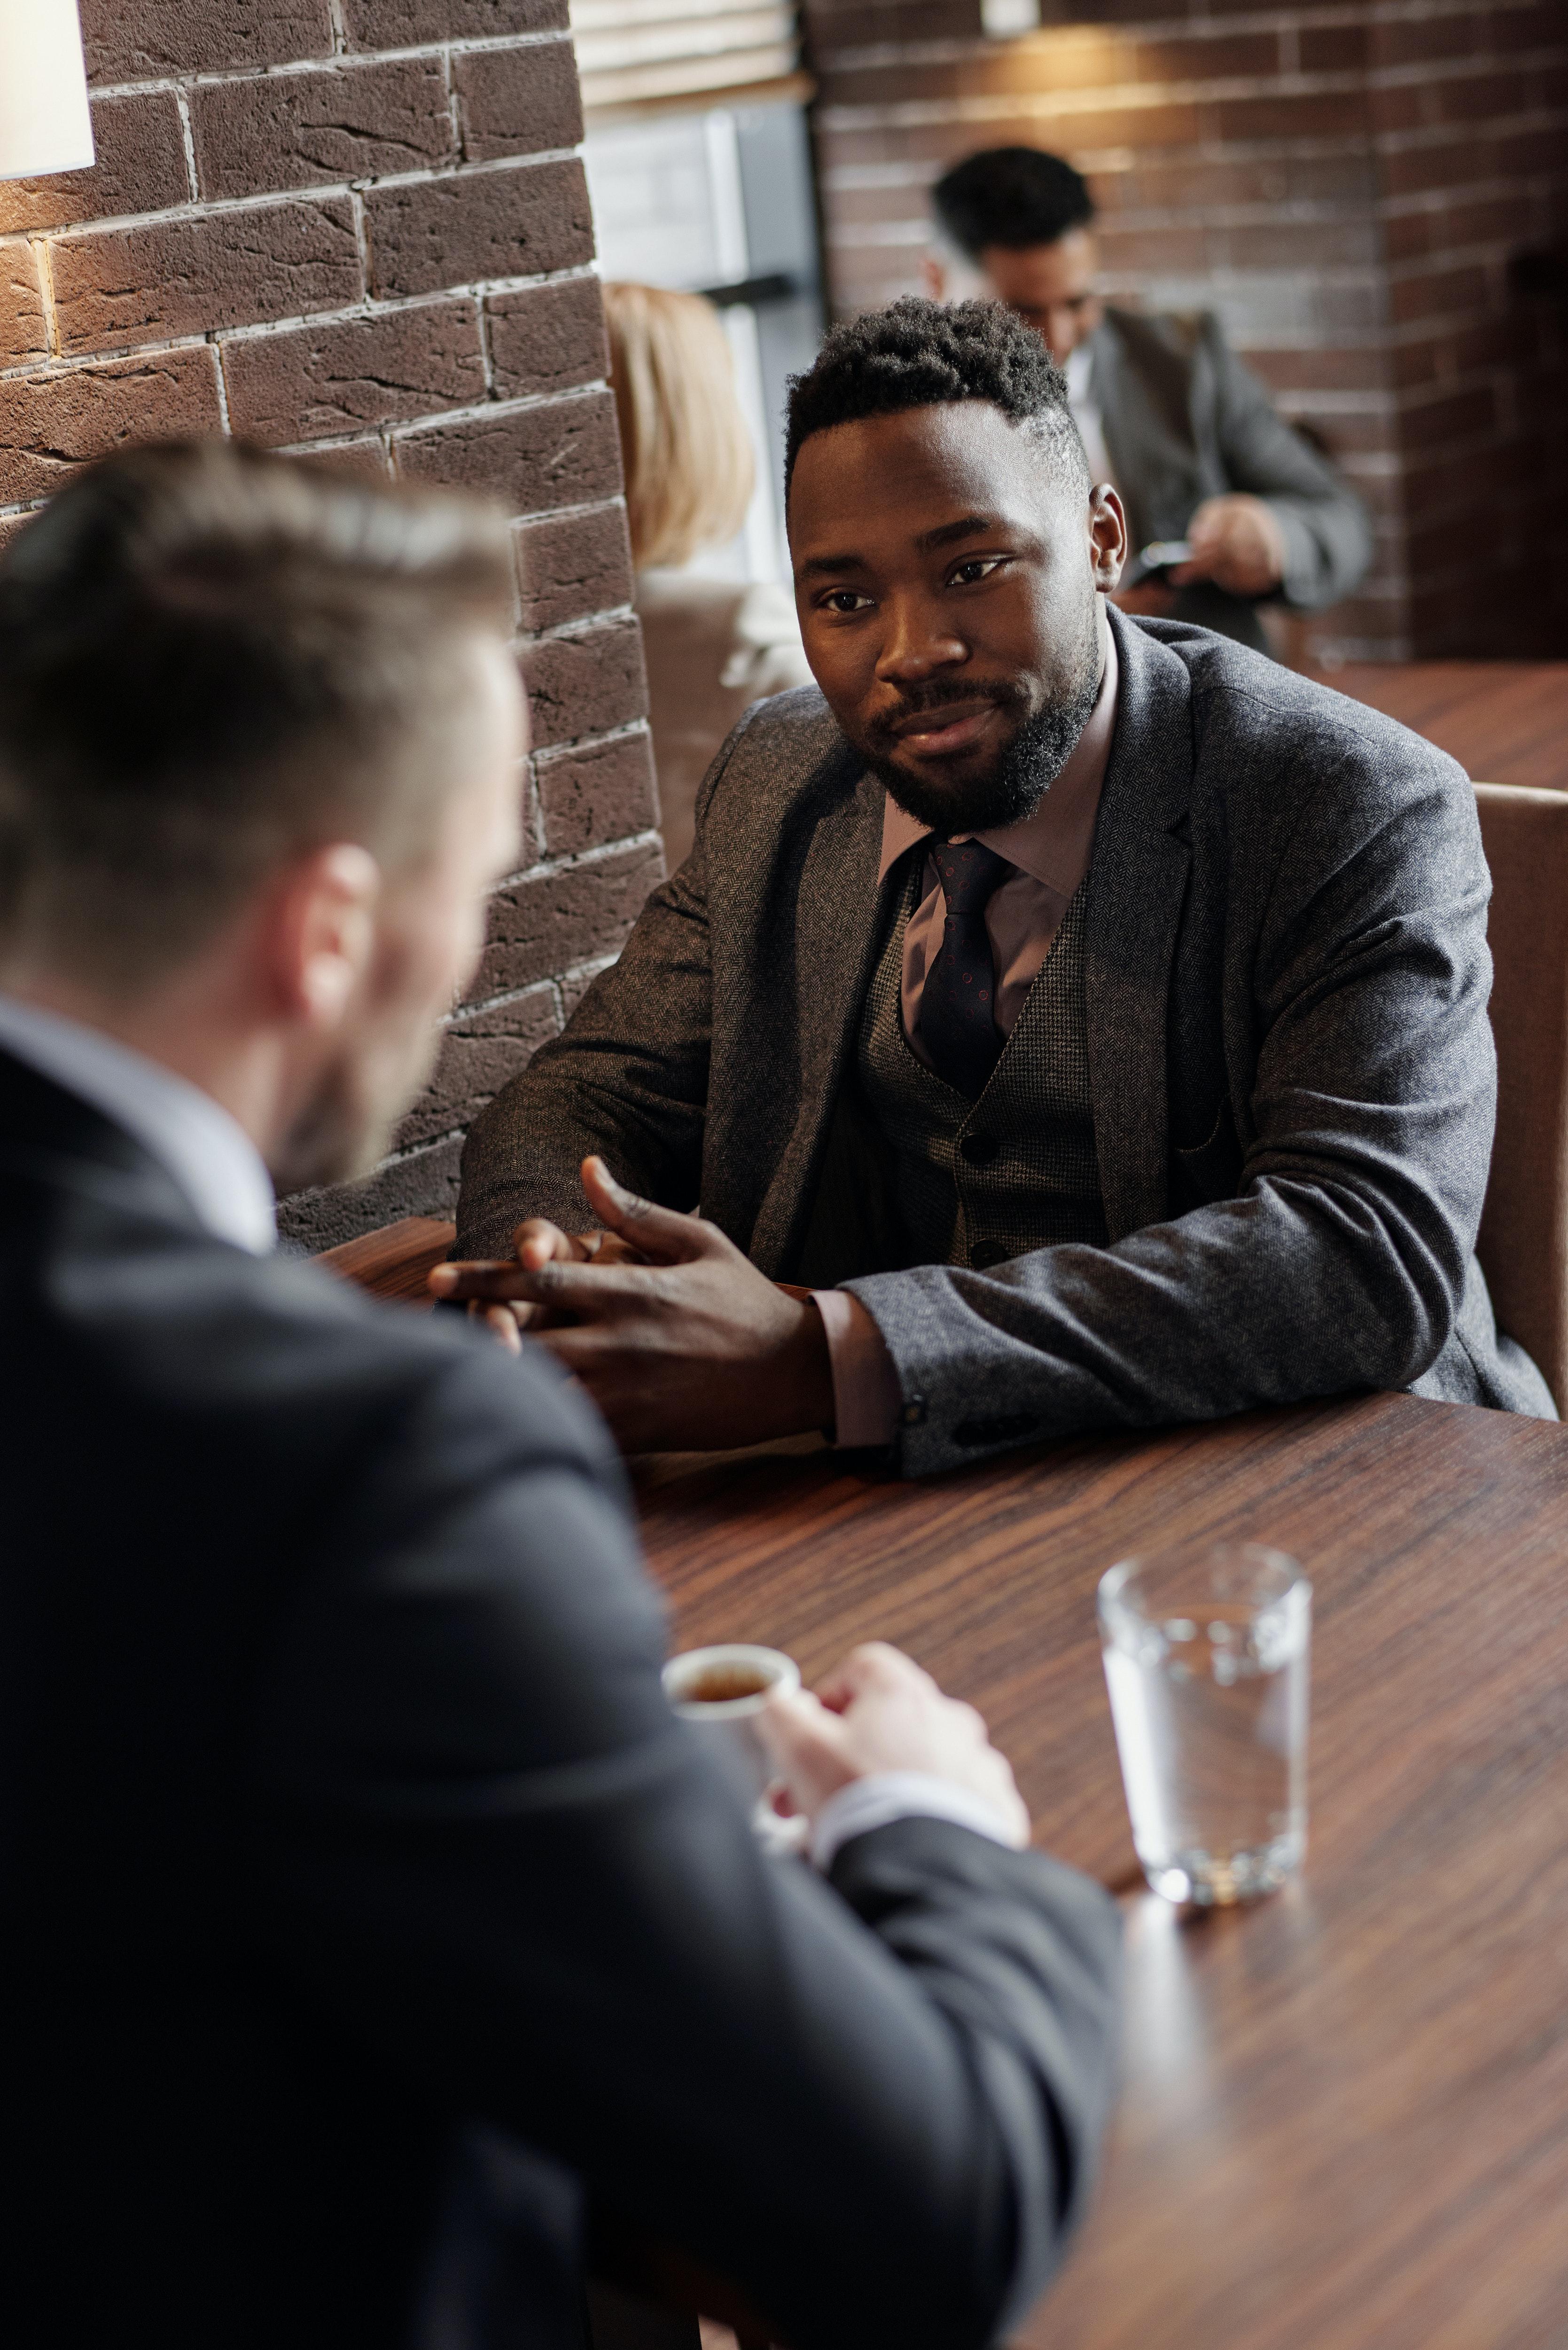 Two men having a meeting at a restaurant. | Photo: Pexels